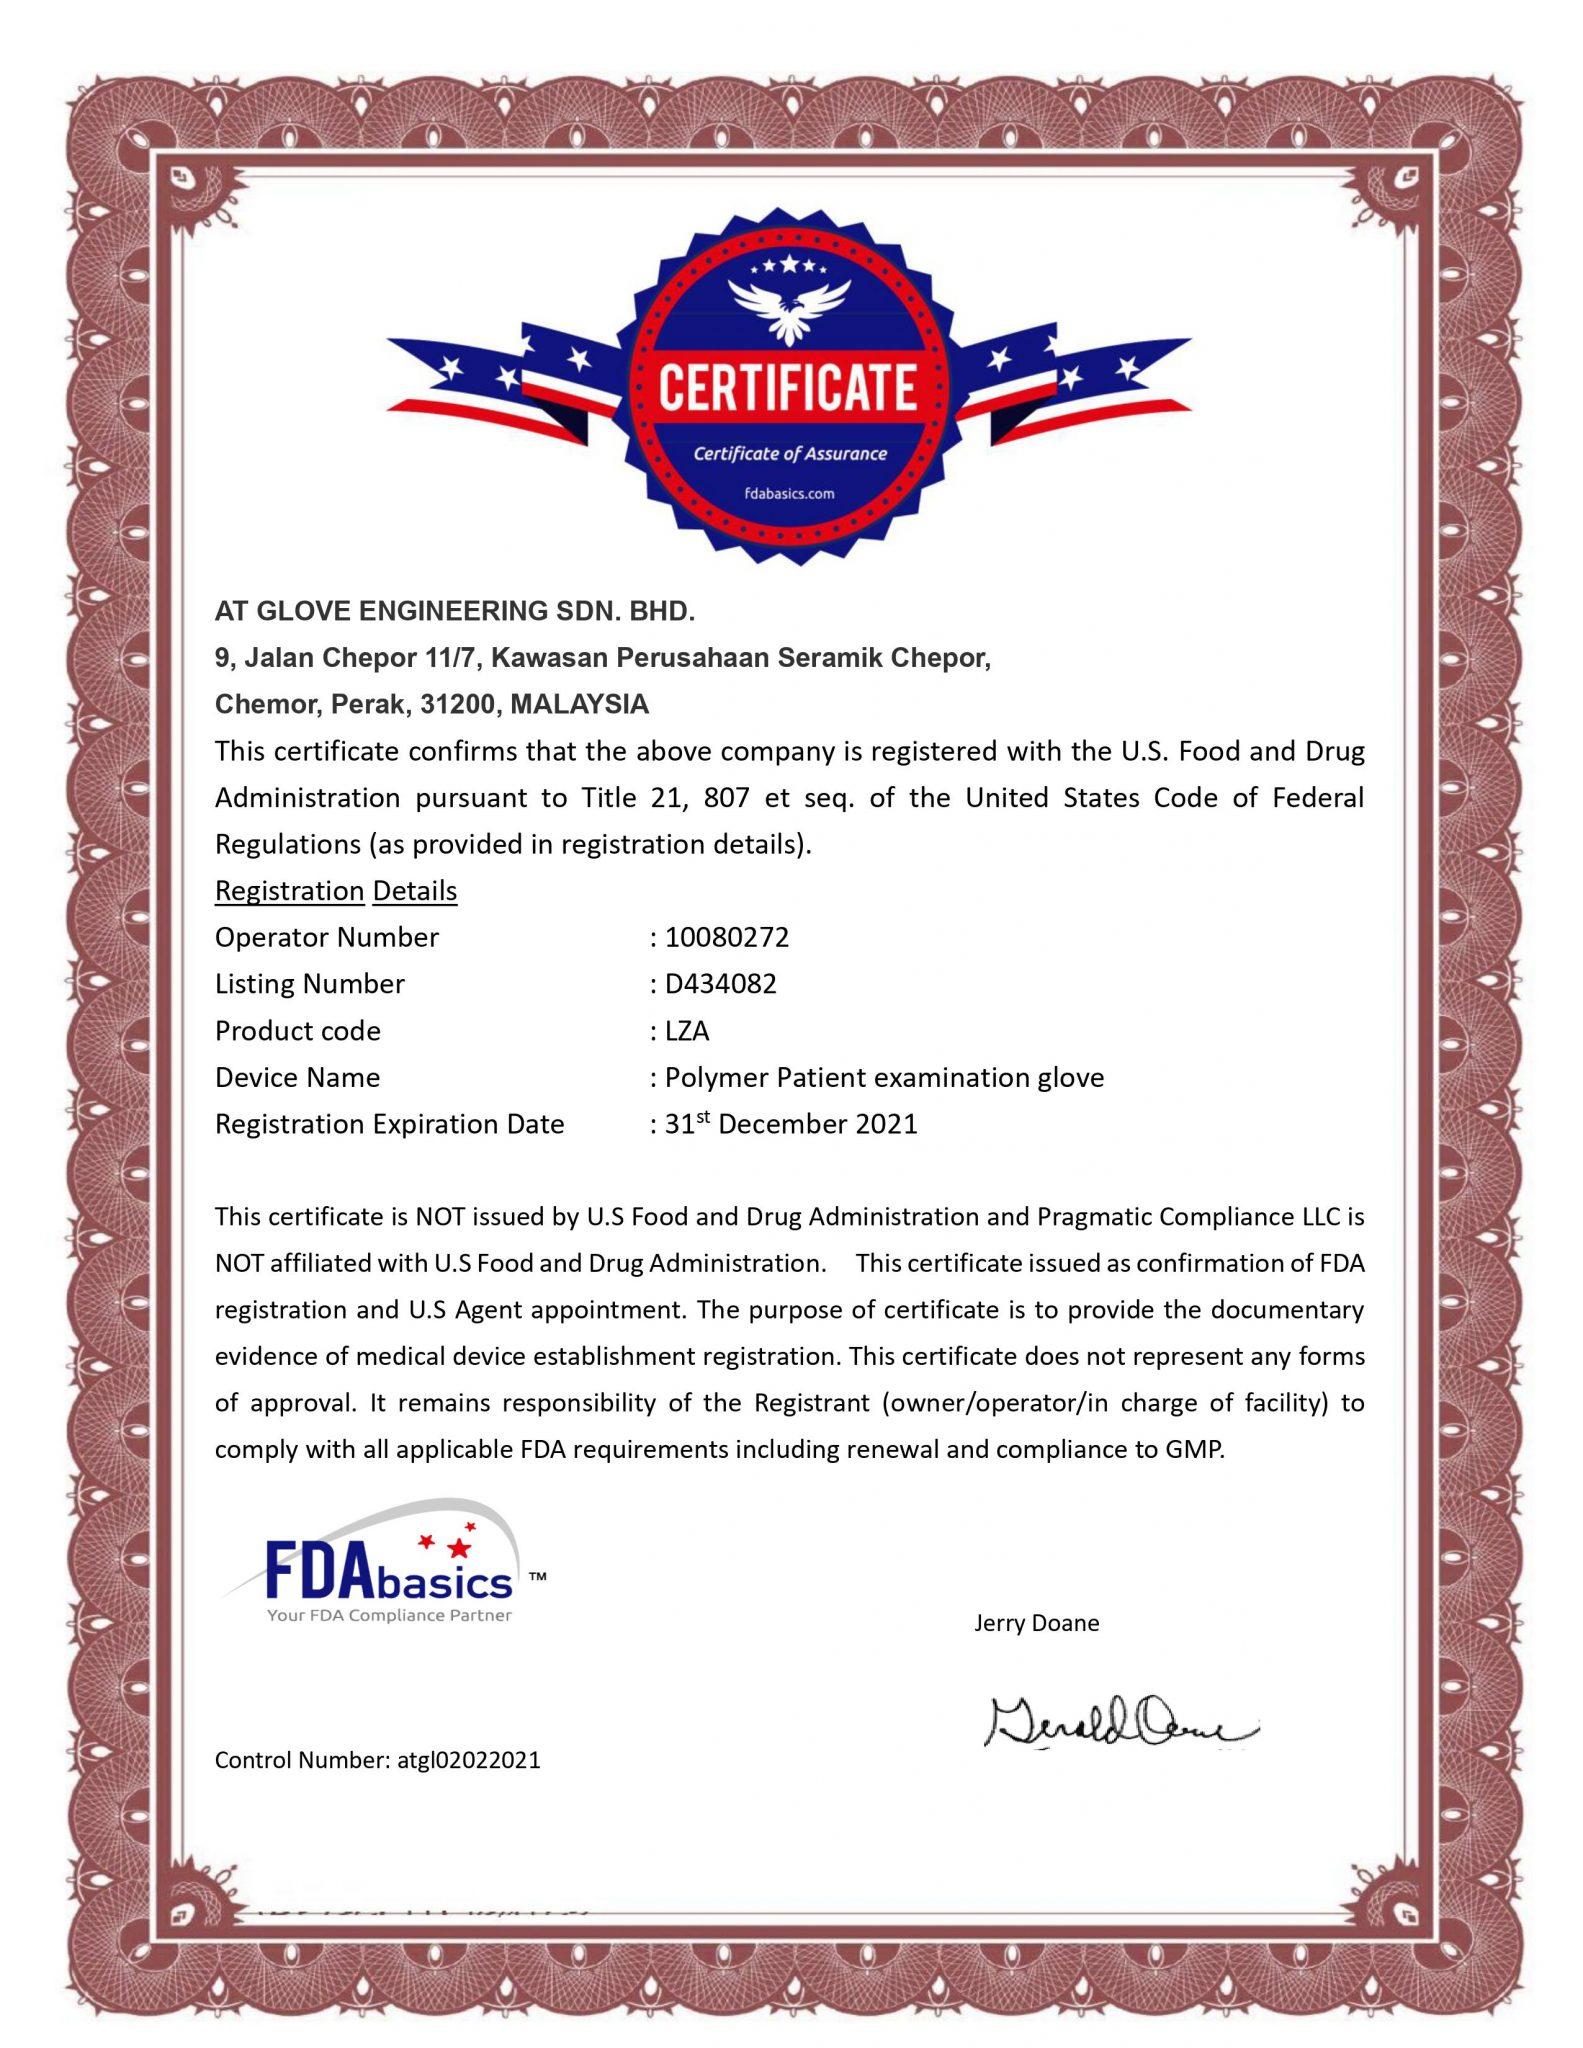 AT GLOVE ENGINEERING SDN BHD - FDA